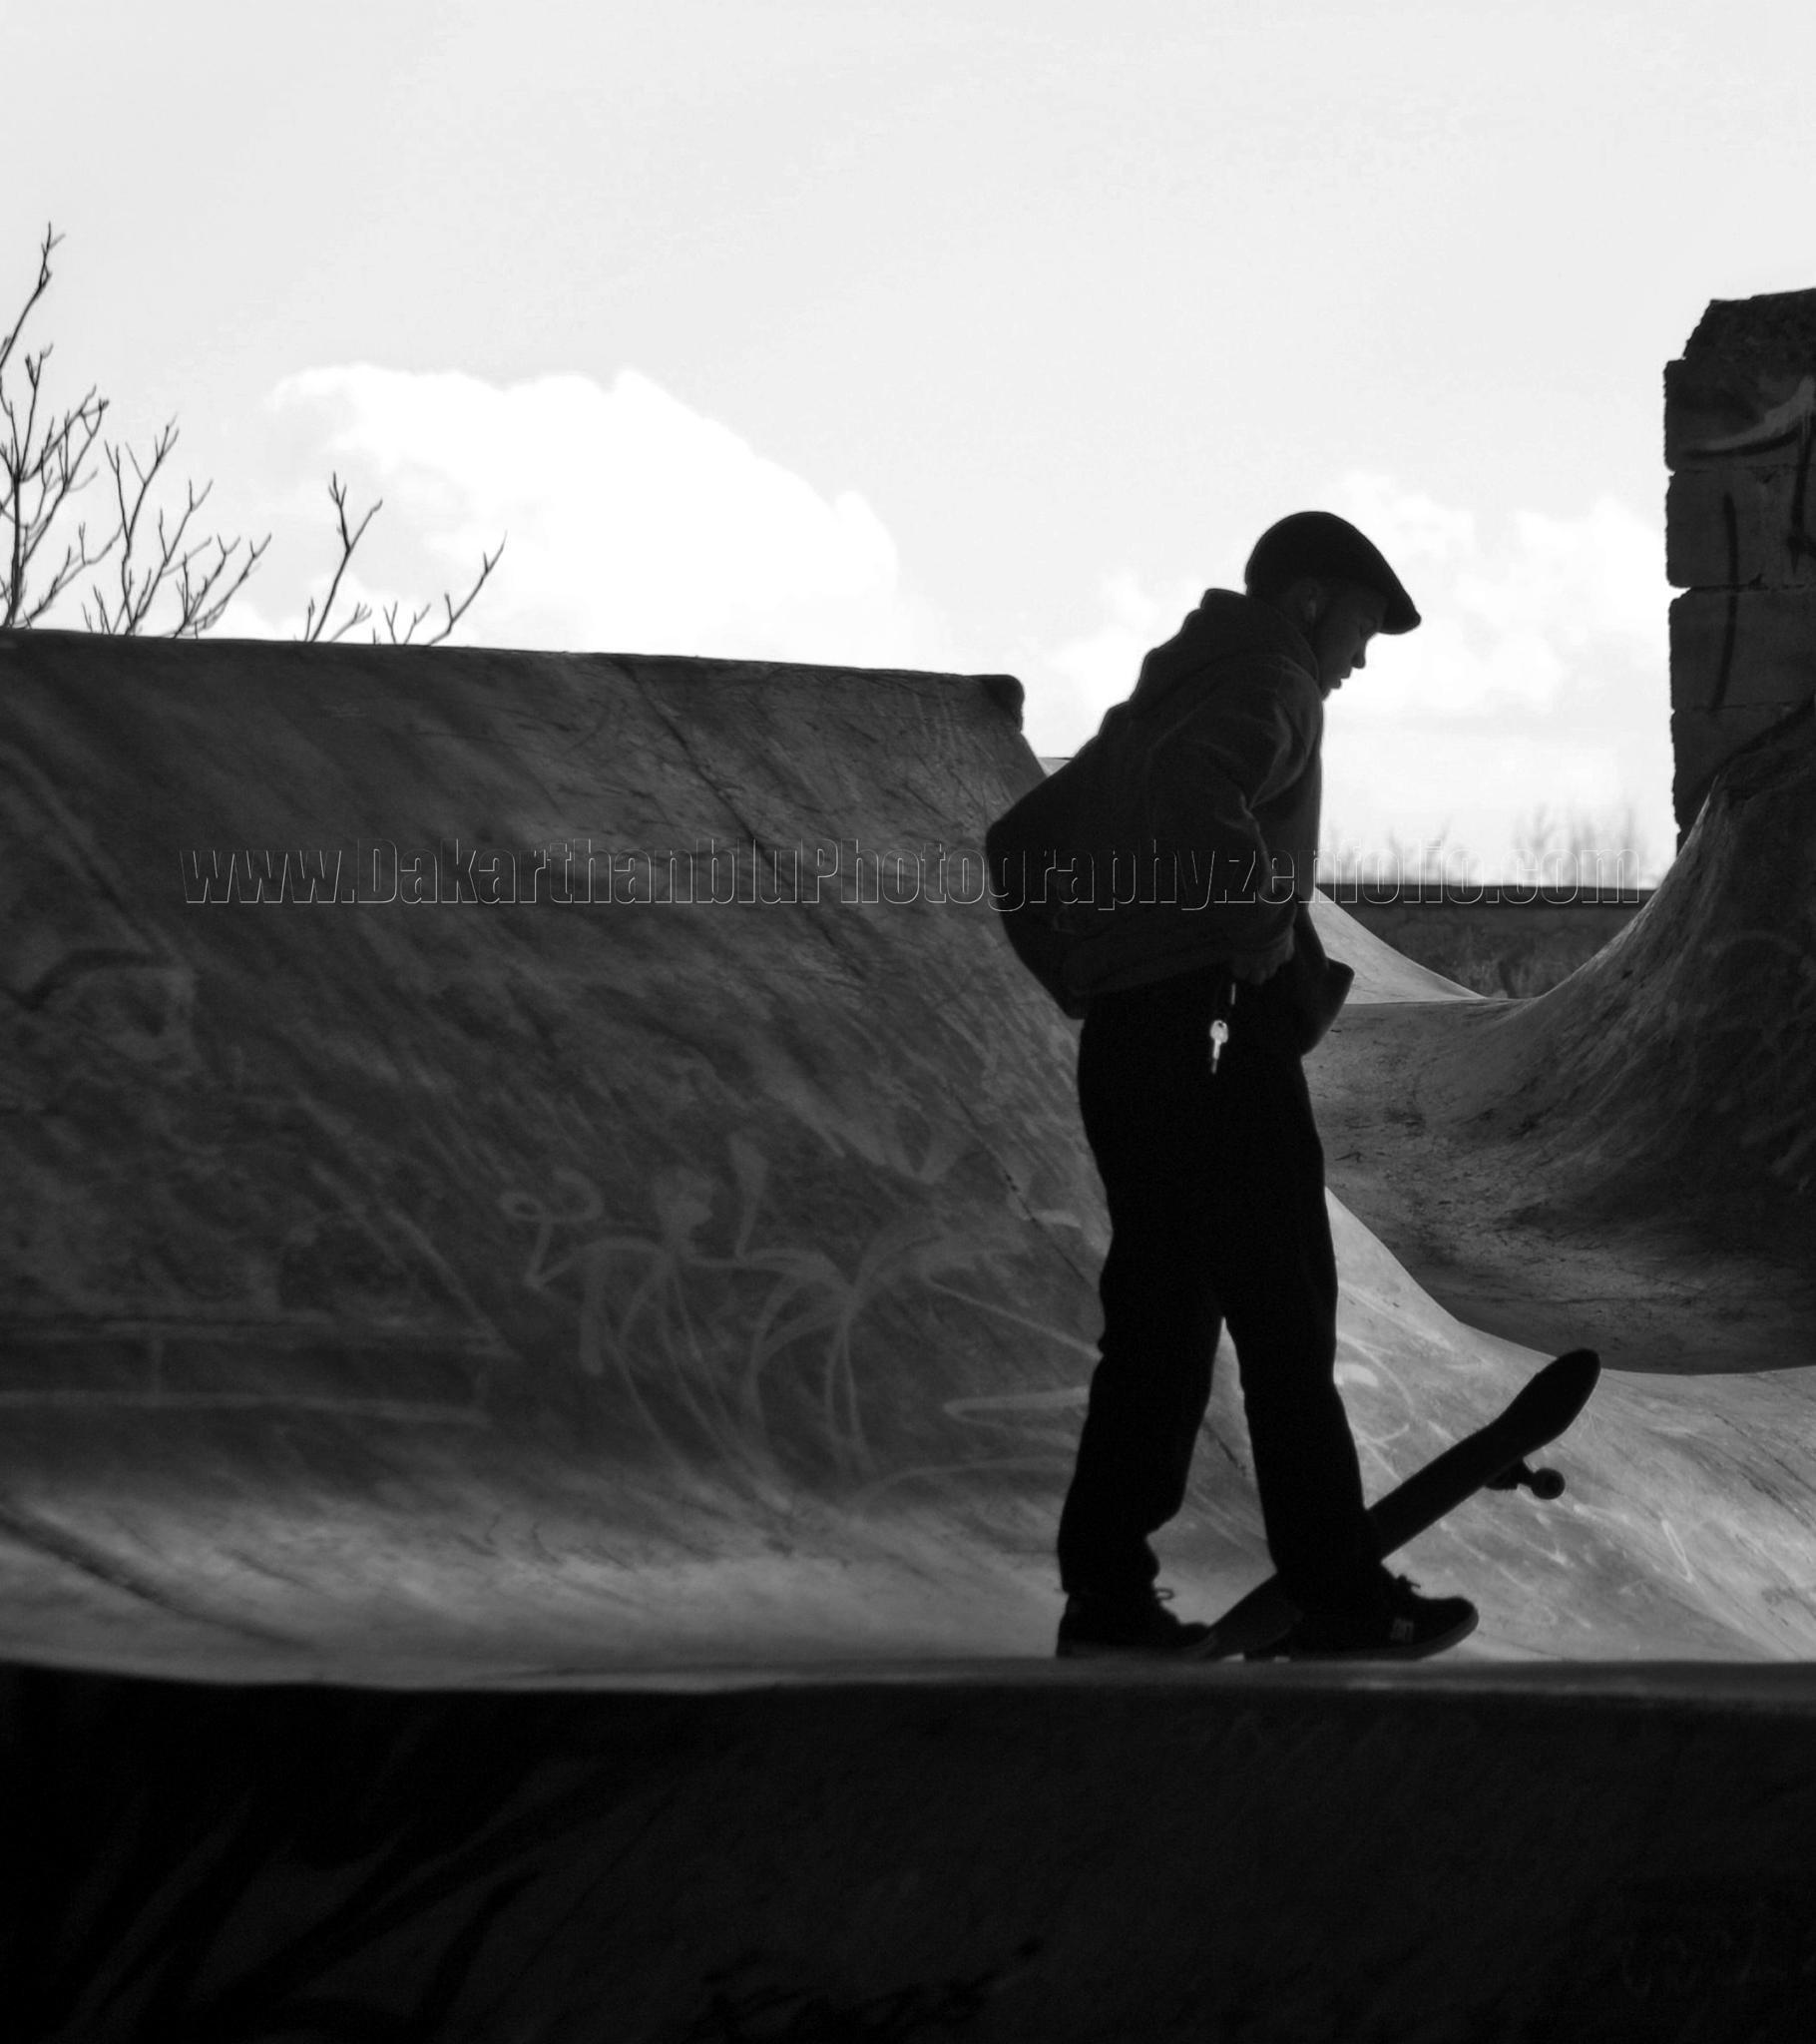 Pensive skater by Richard Rykard